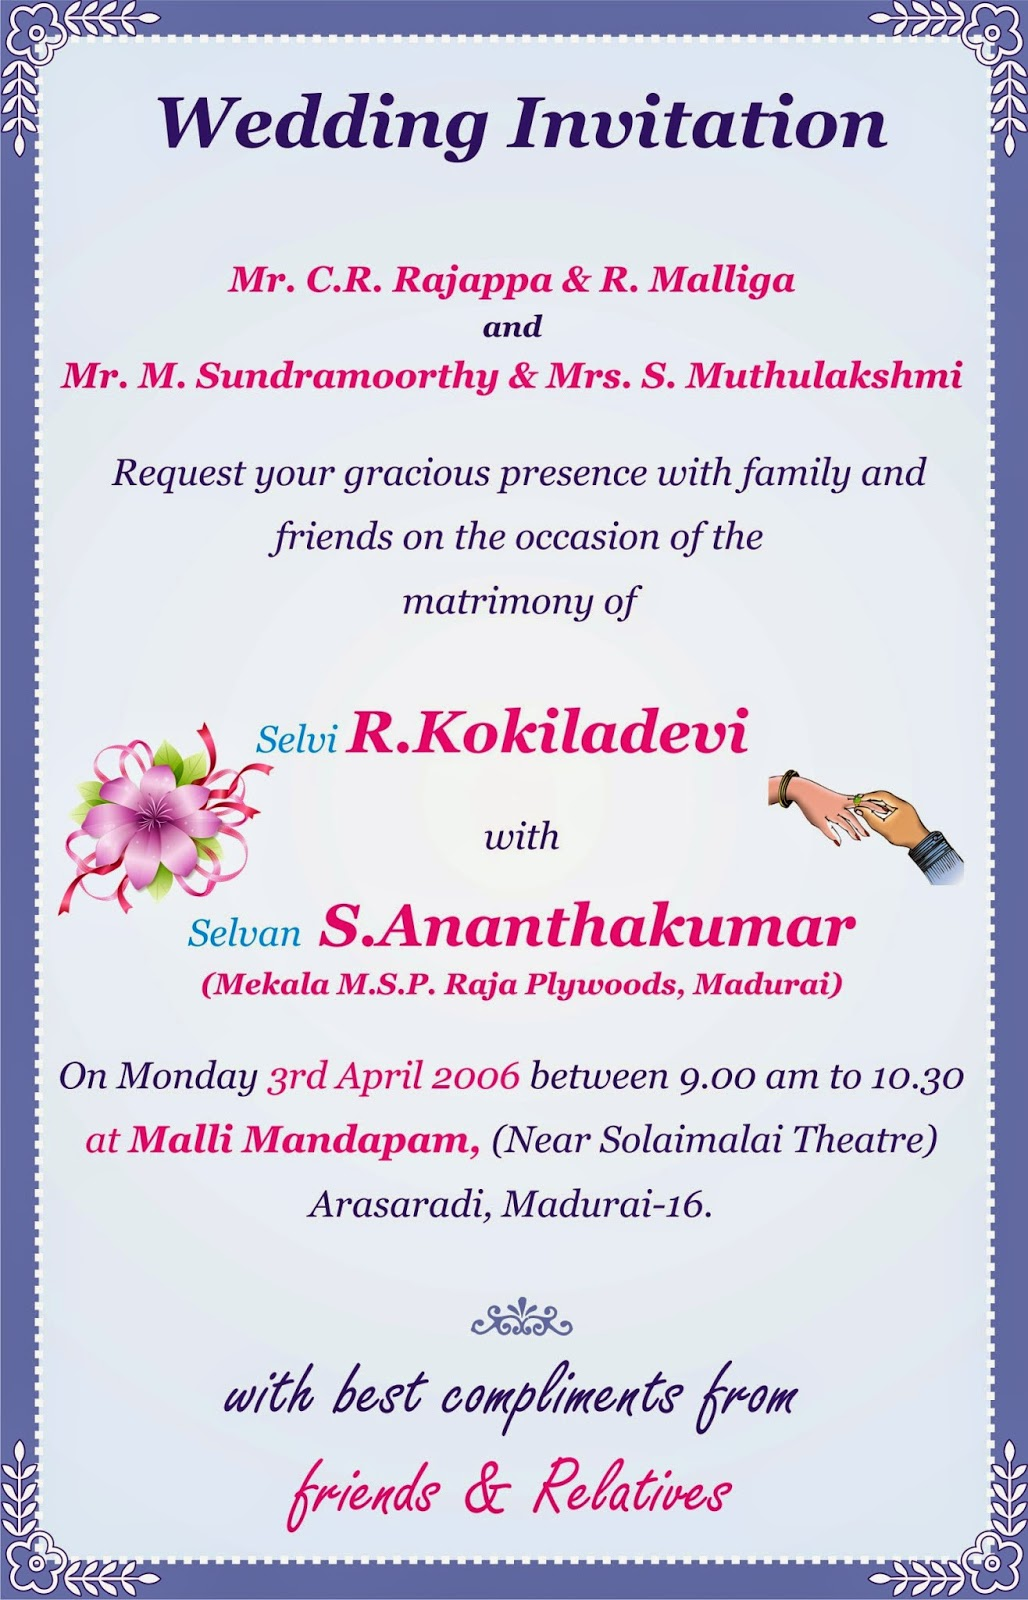 Ramani achagam invitation models invitation models stopboris Gallery